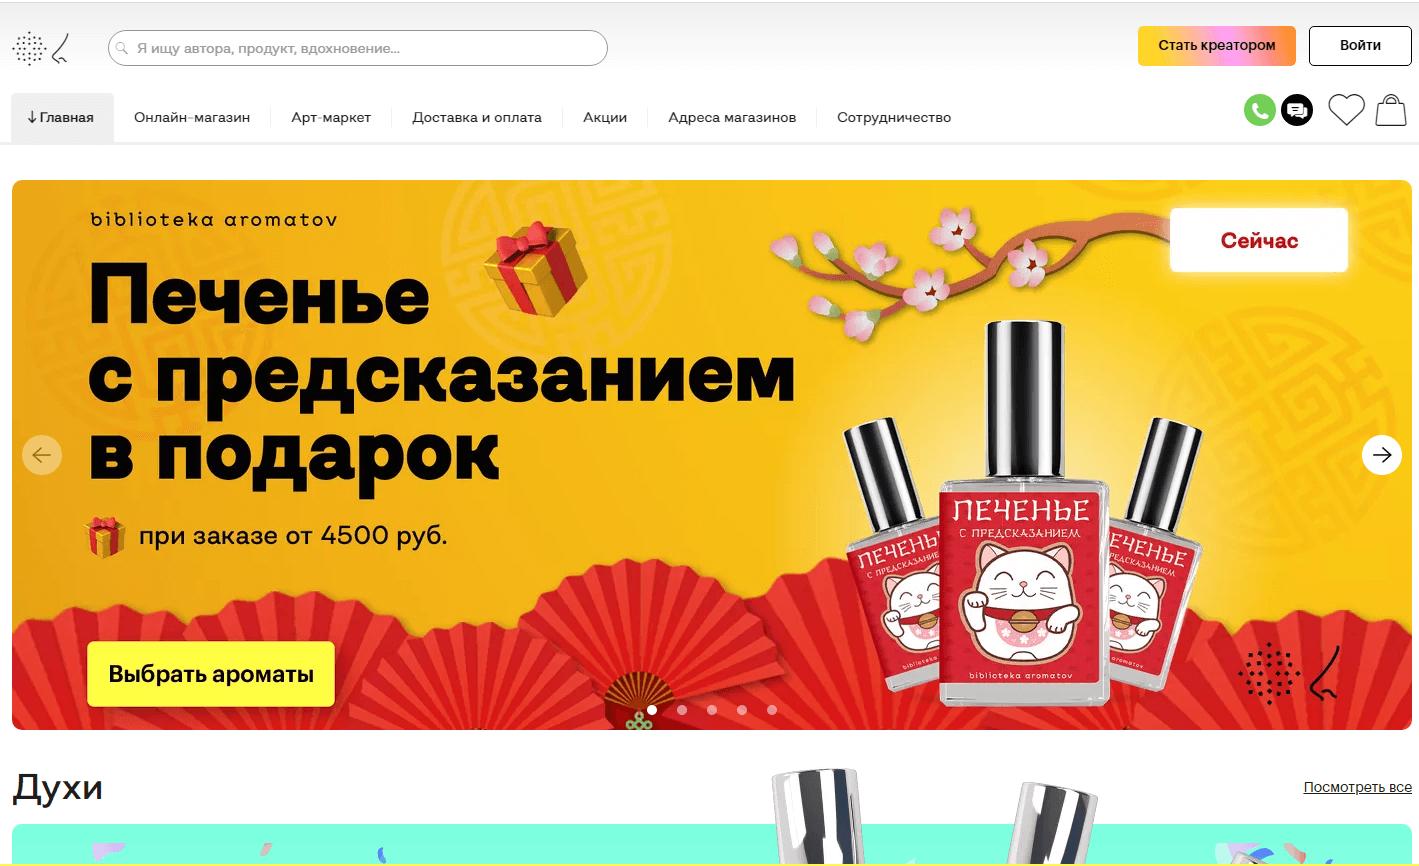 biblioteka.shop website